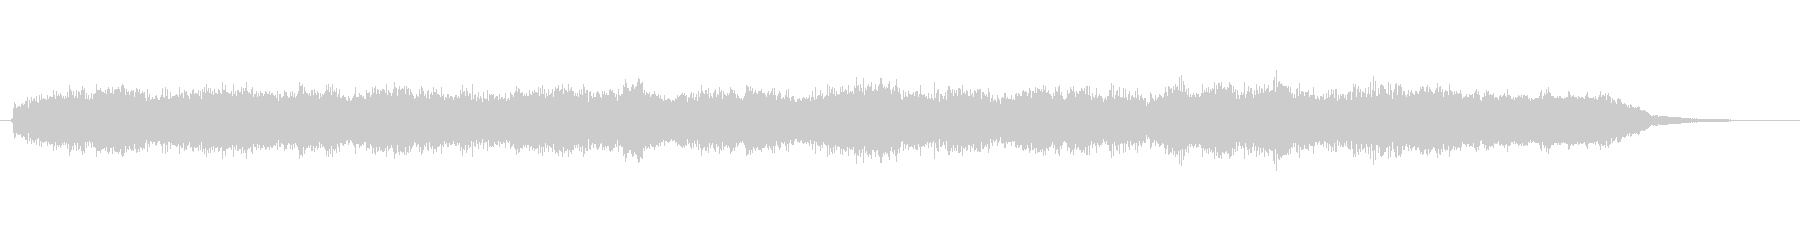 CM30秒、感動的なピアノ、ストリングスの未再生の波形